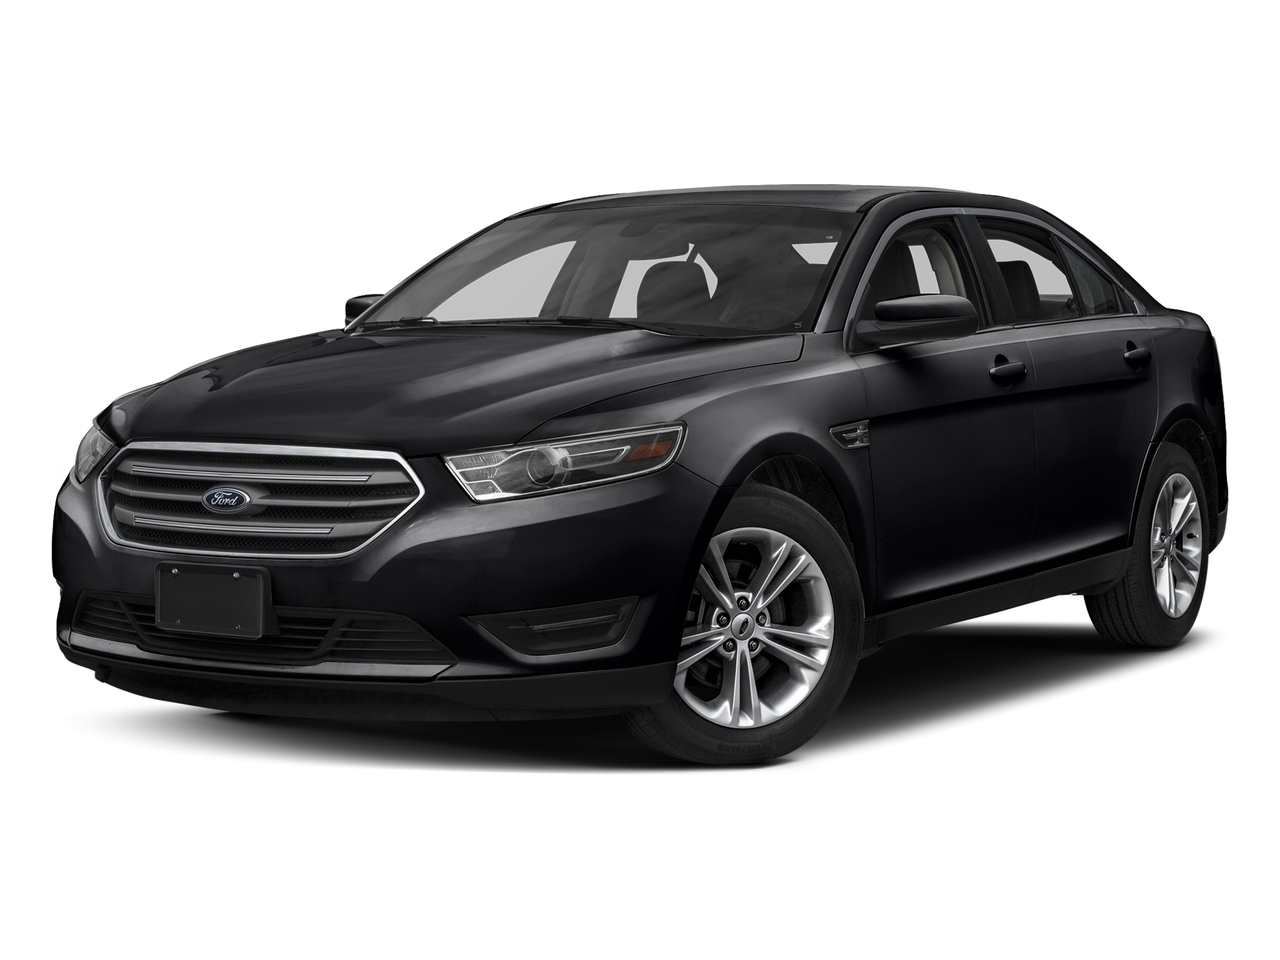 2016 Ford Taurus LIMITED 4dr Car Slide